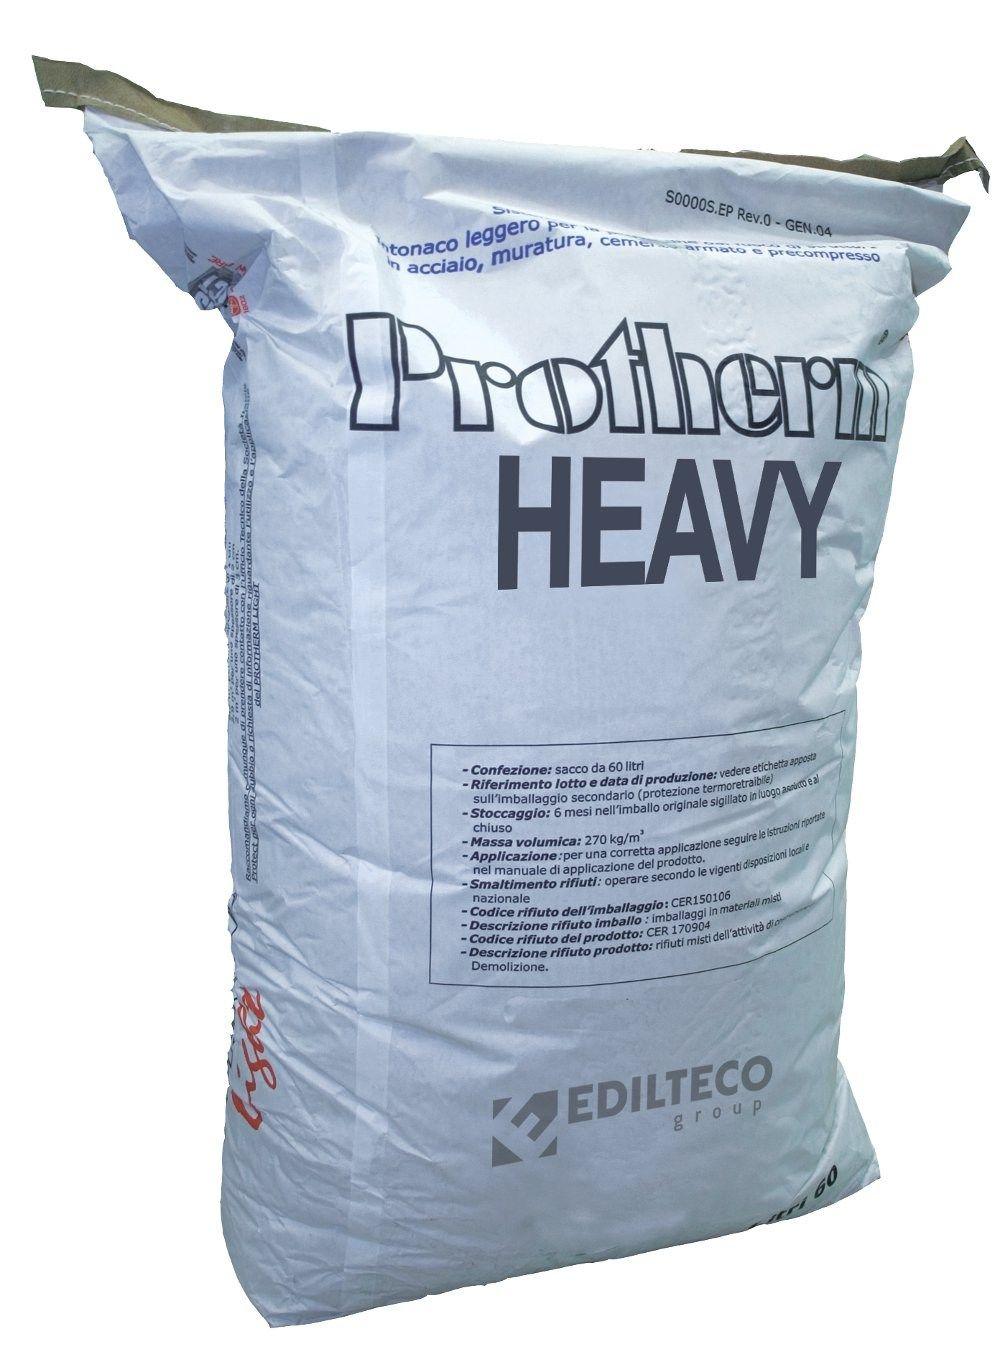 Fire Resistant Plaster : Fire resistant plaster protherm heavy by edilteco